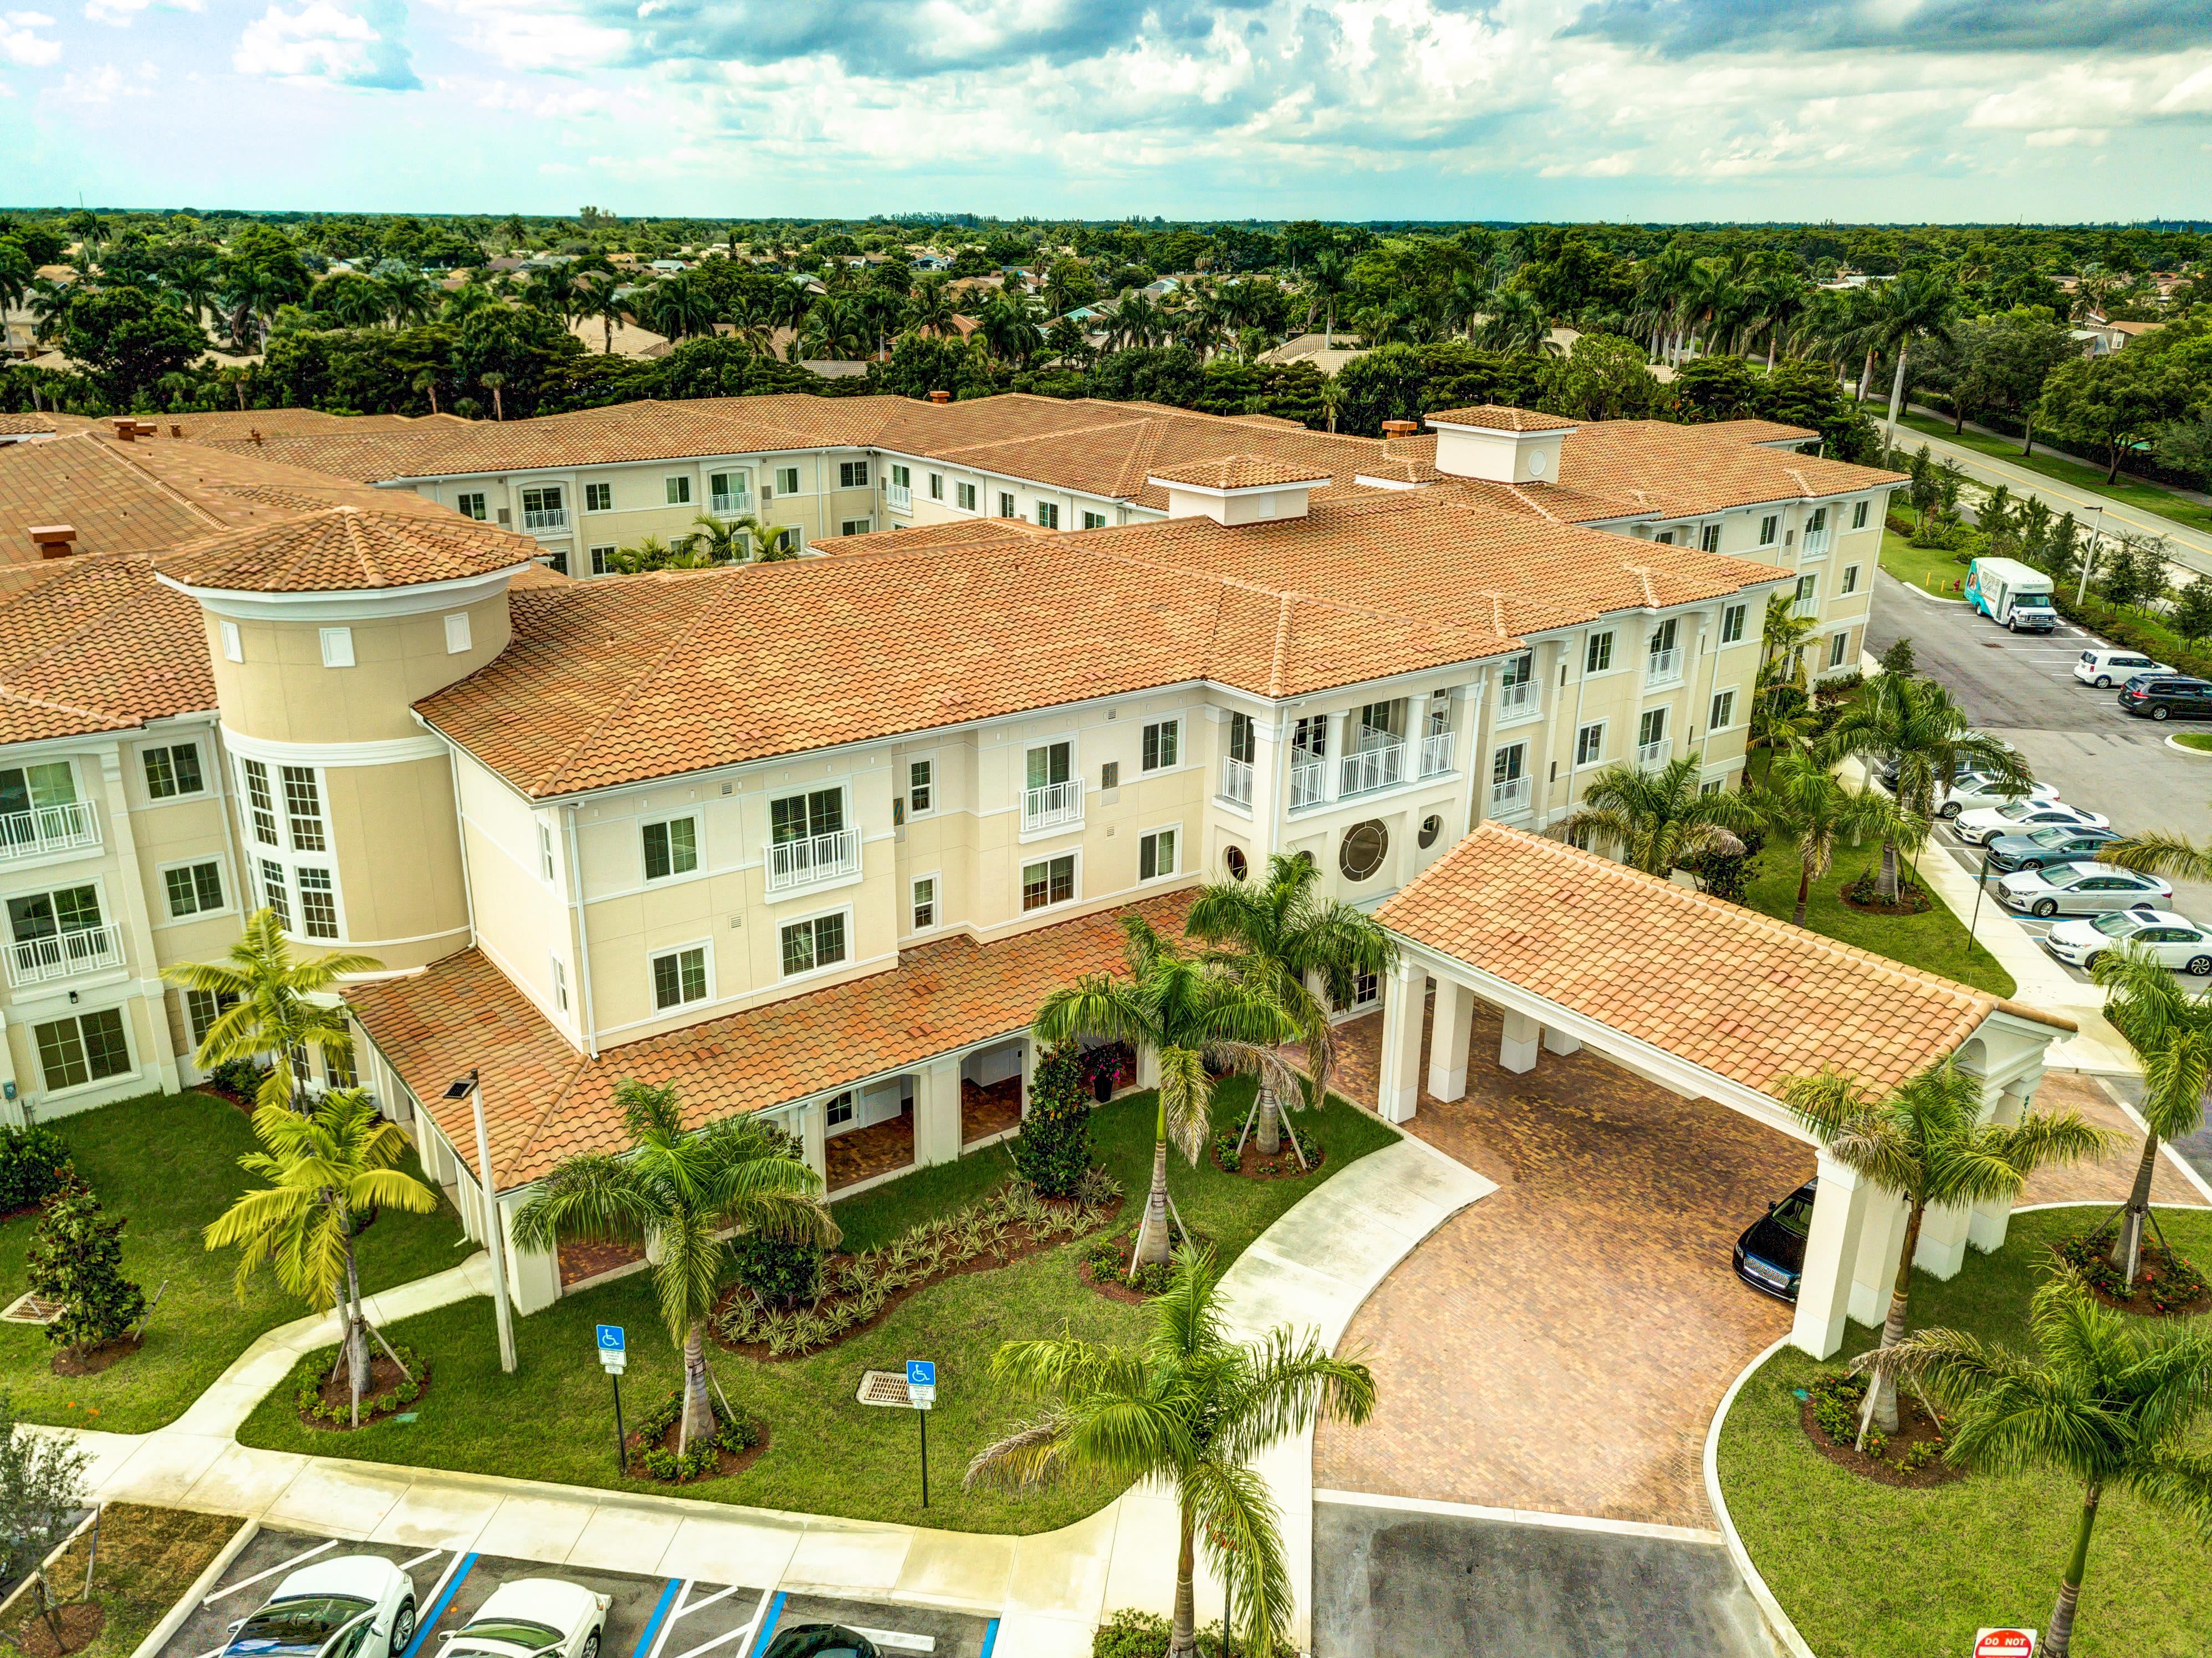 View of the campus surrounding The Meridian at Boca Raton in Boca Raton, Florida